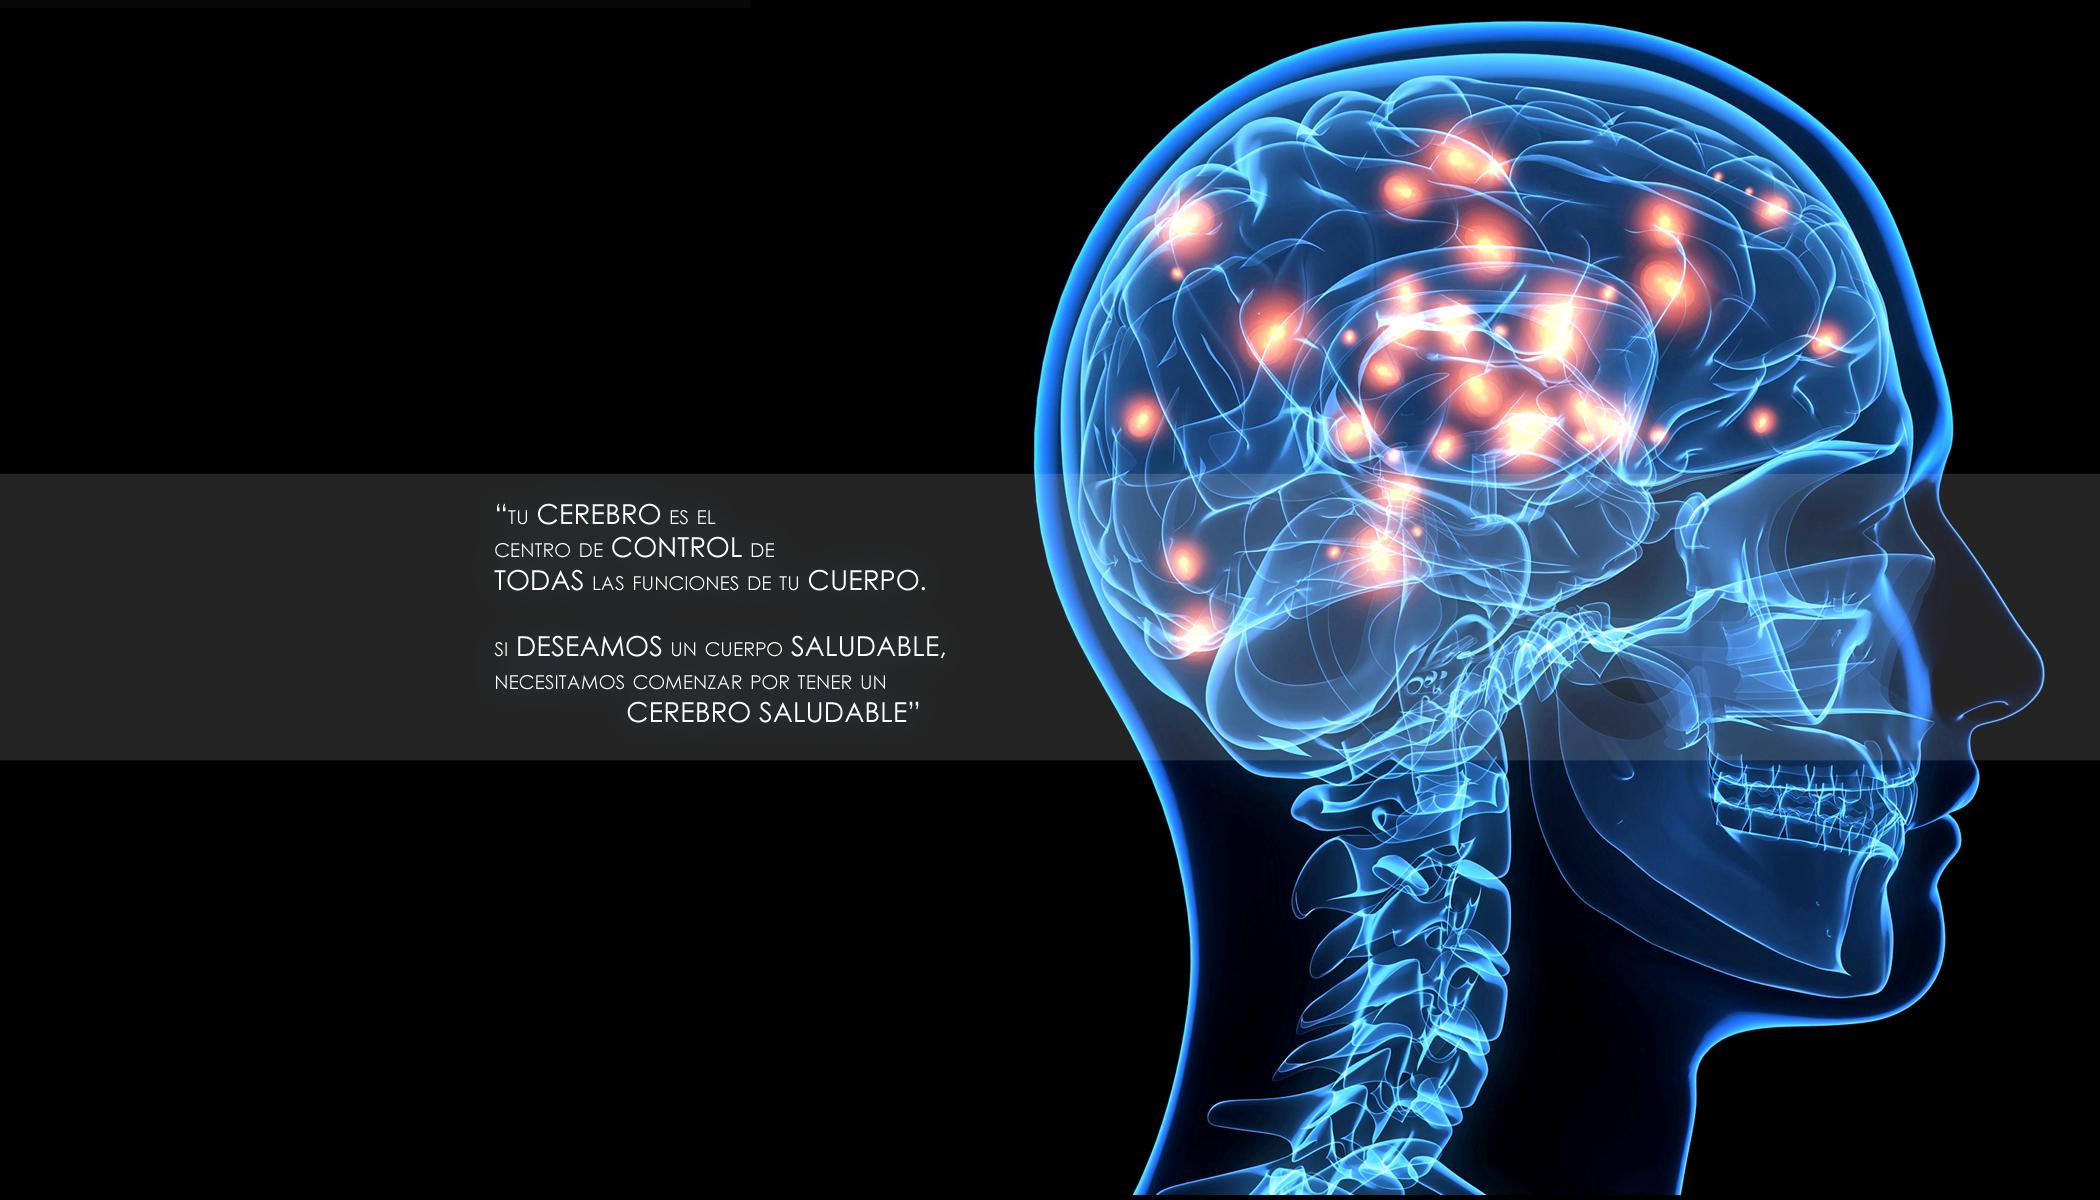 CIHC-Frontpage posters 1 WebMod fact_nologo